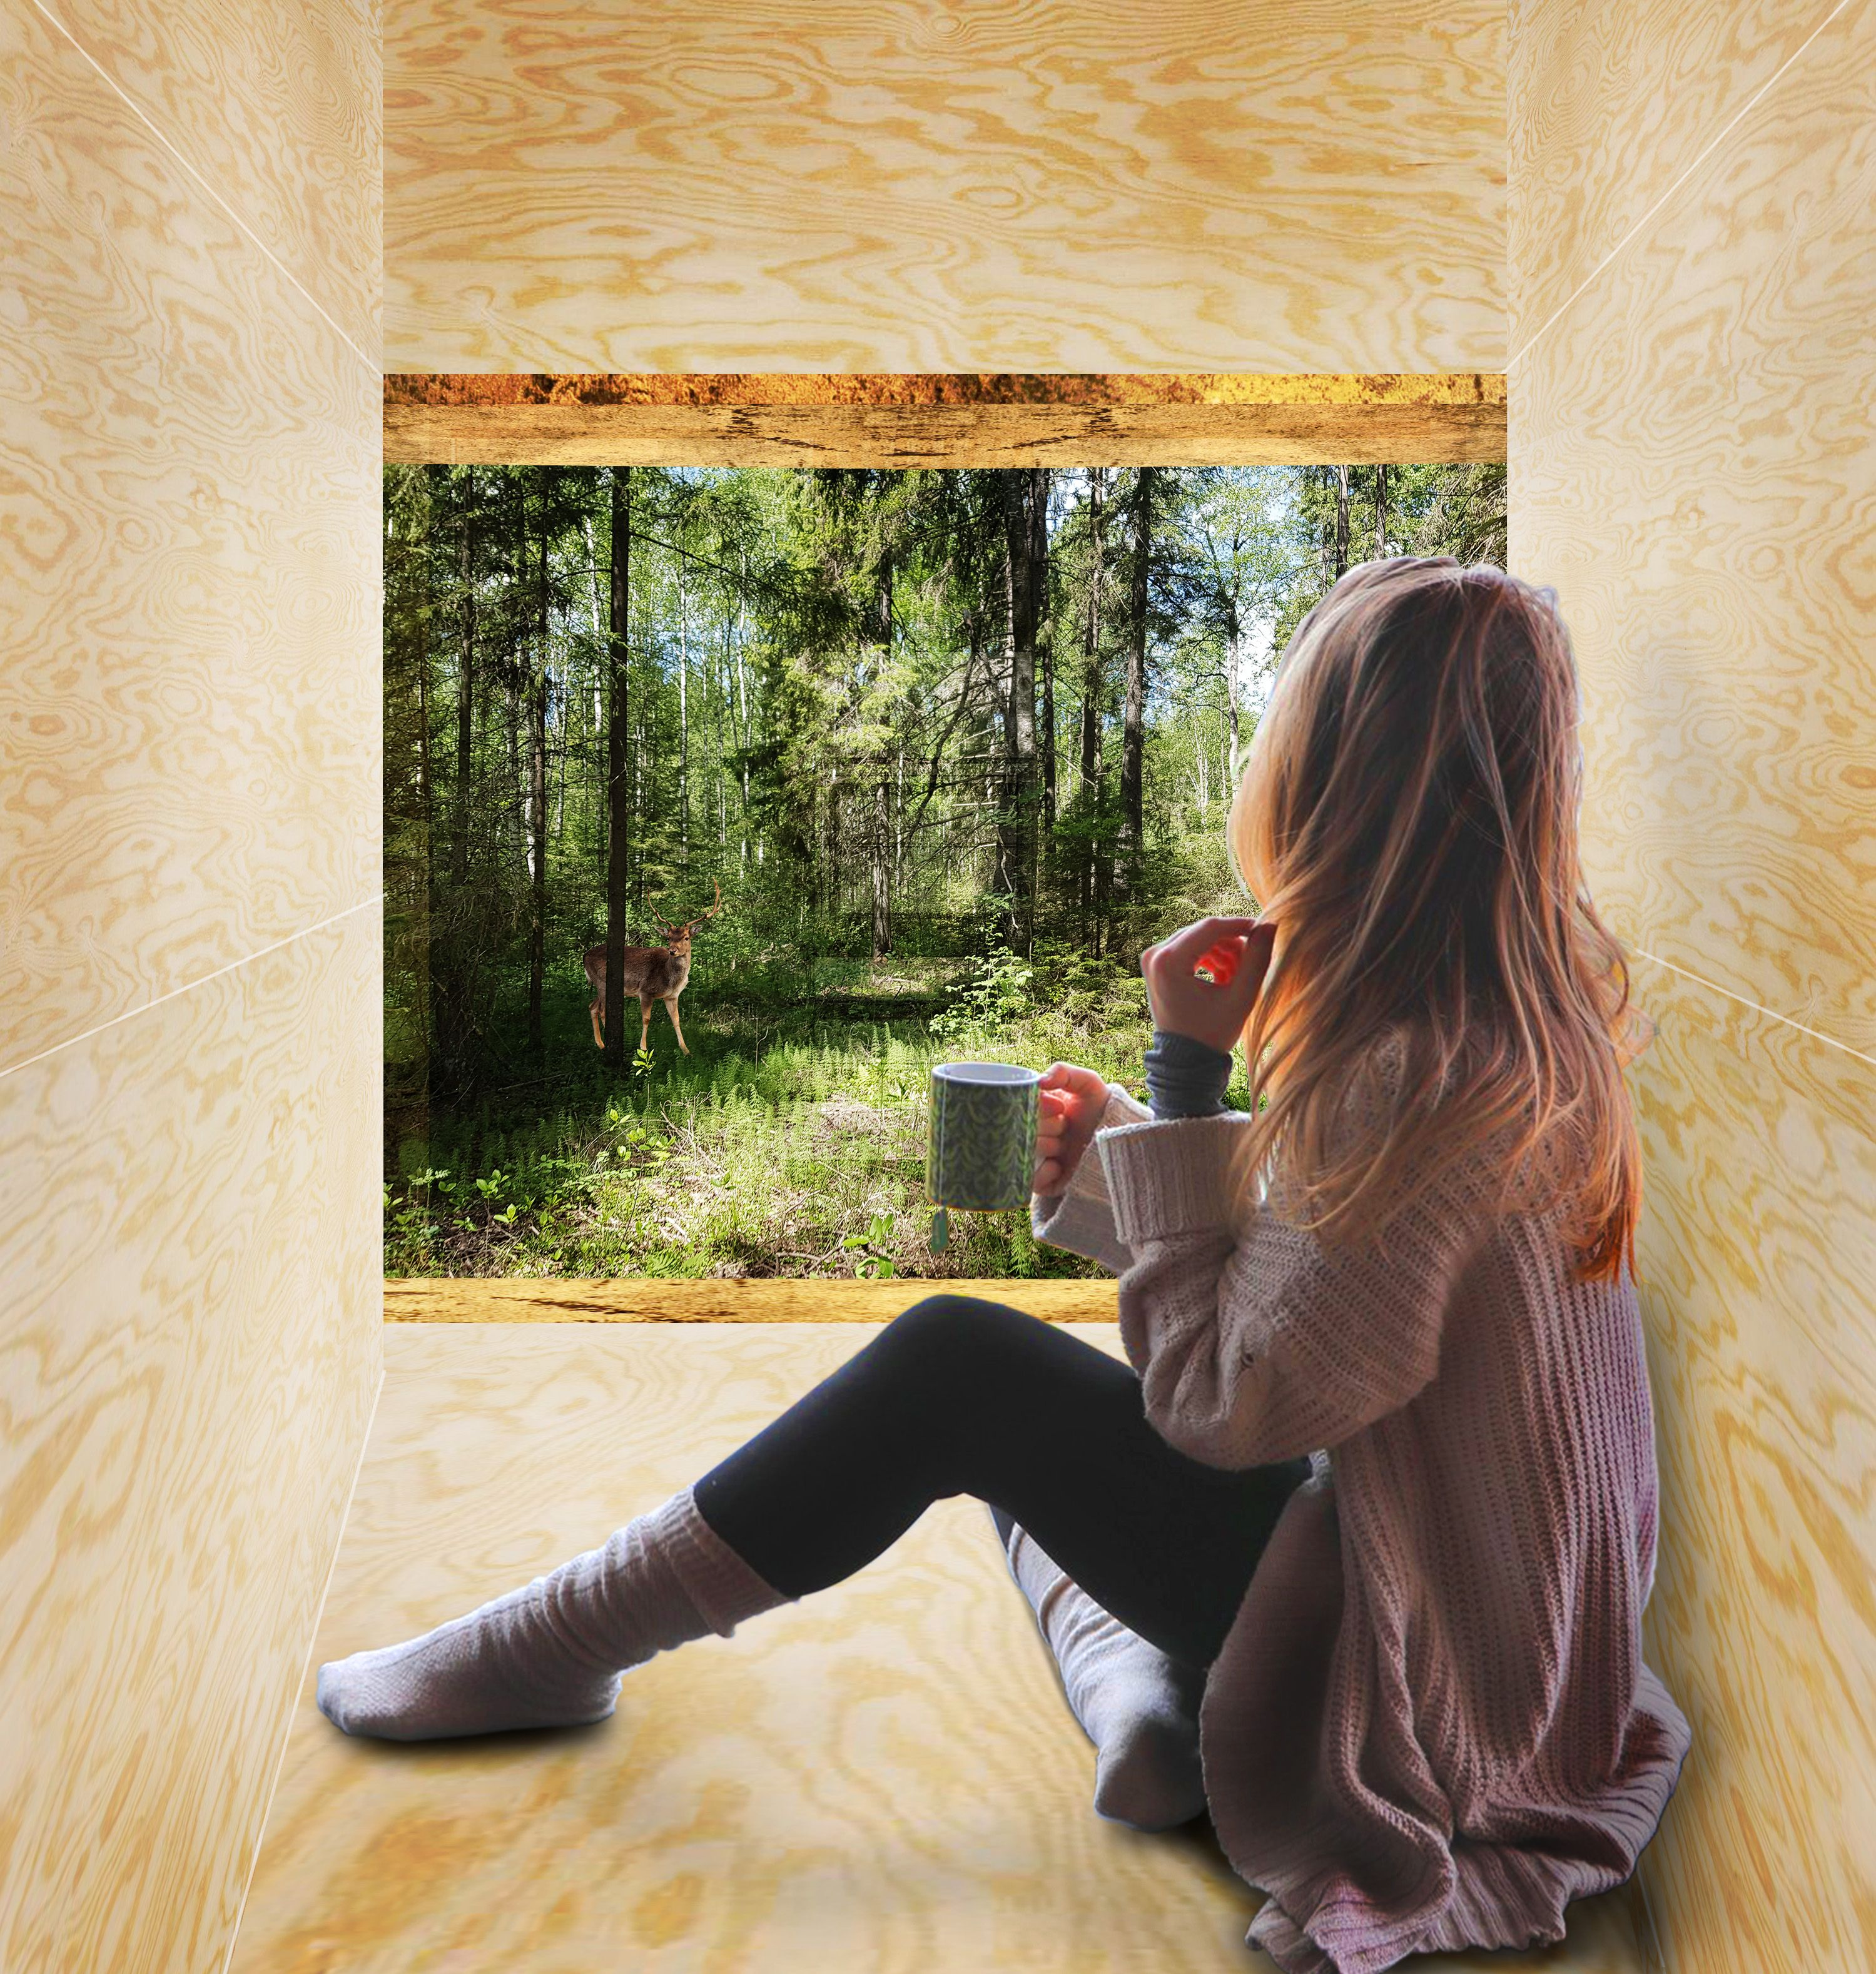 Silent meditation cabin - Studio TMOJ | Cabin, Cabins in ...